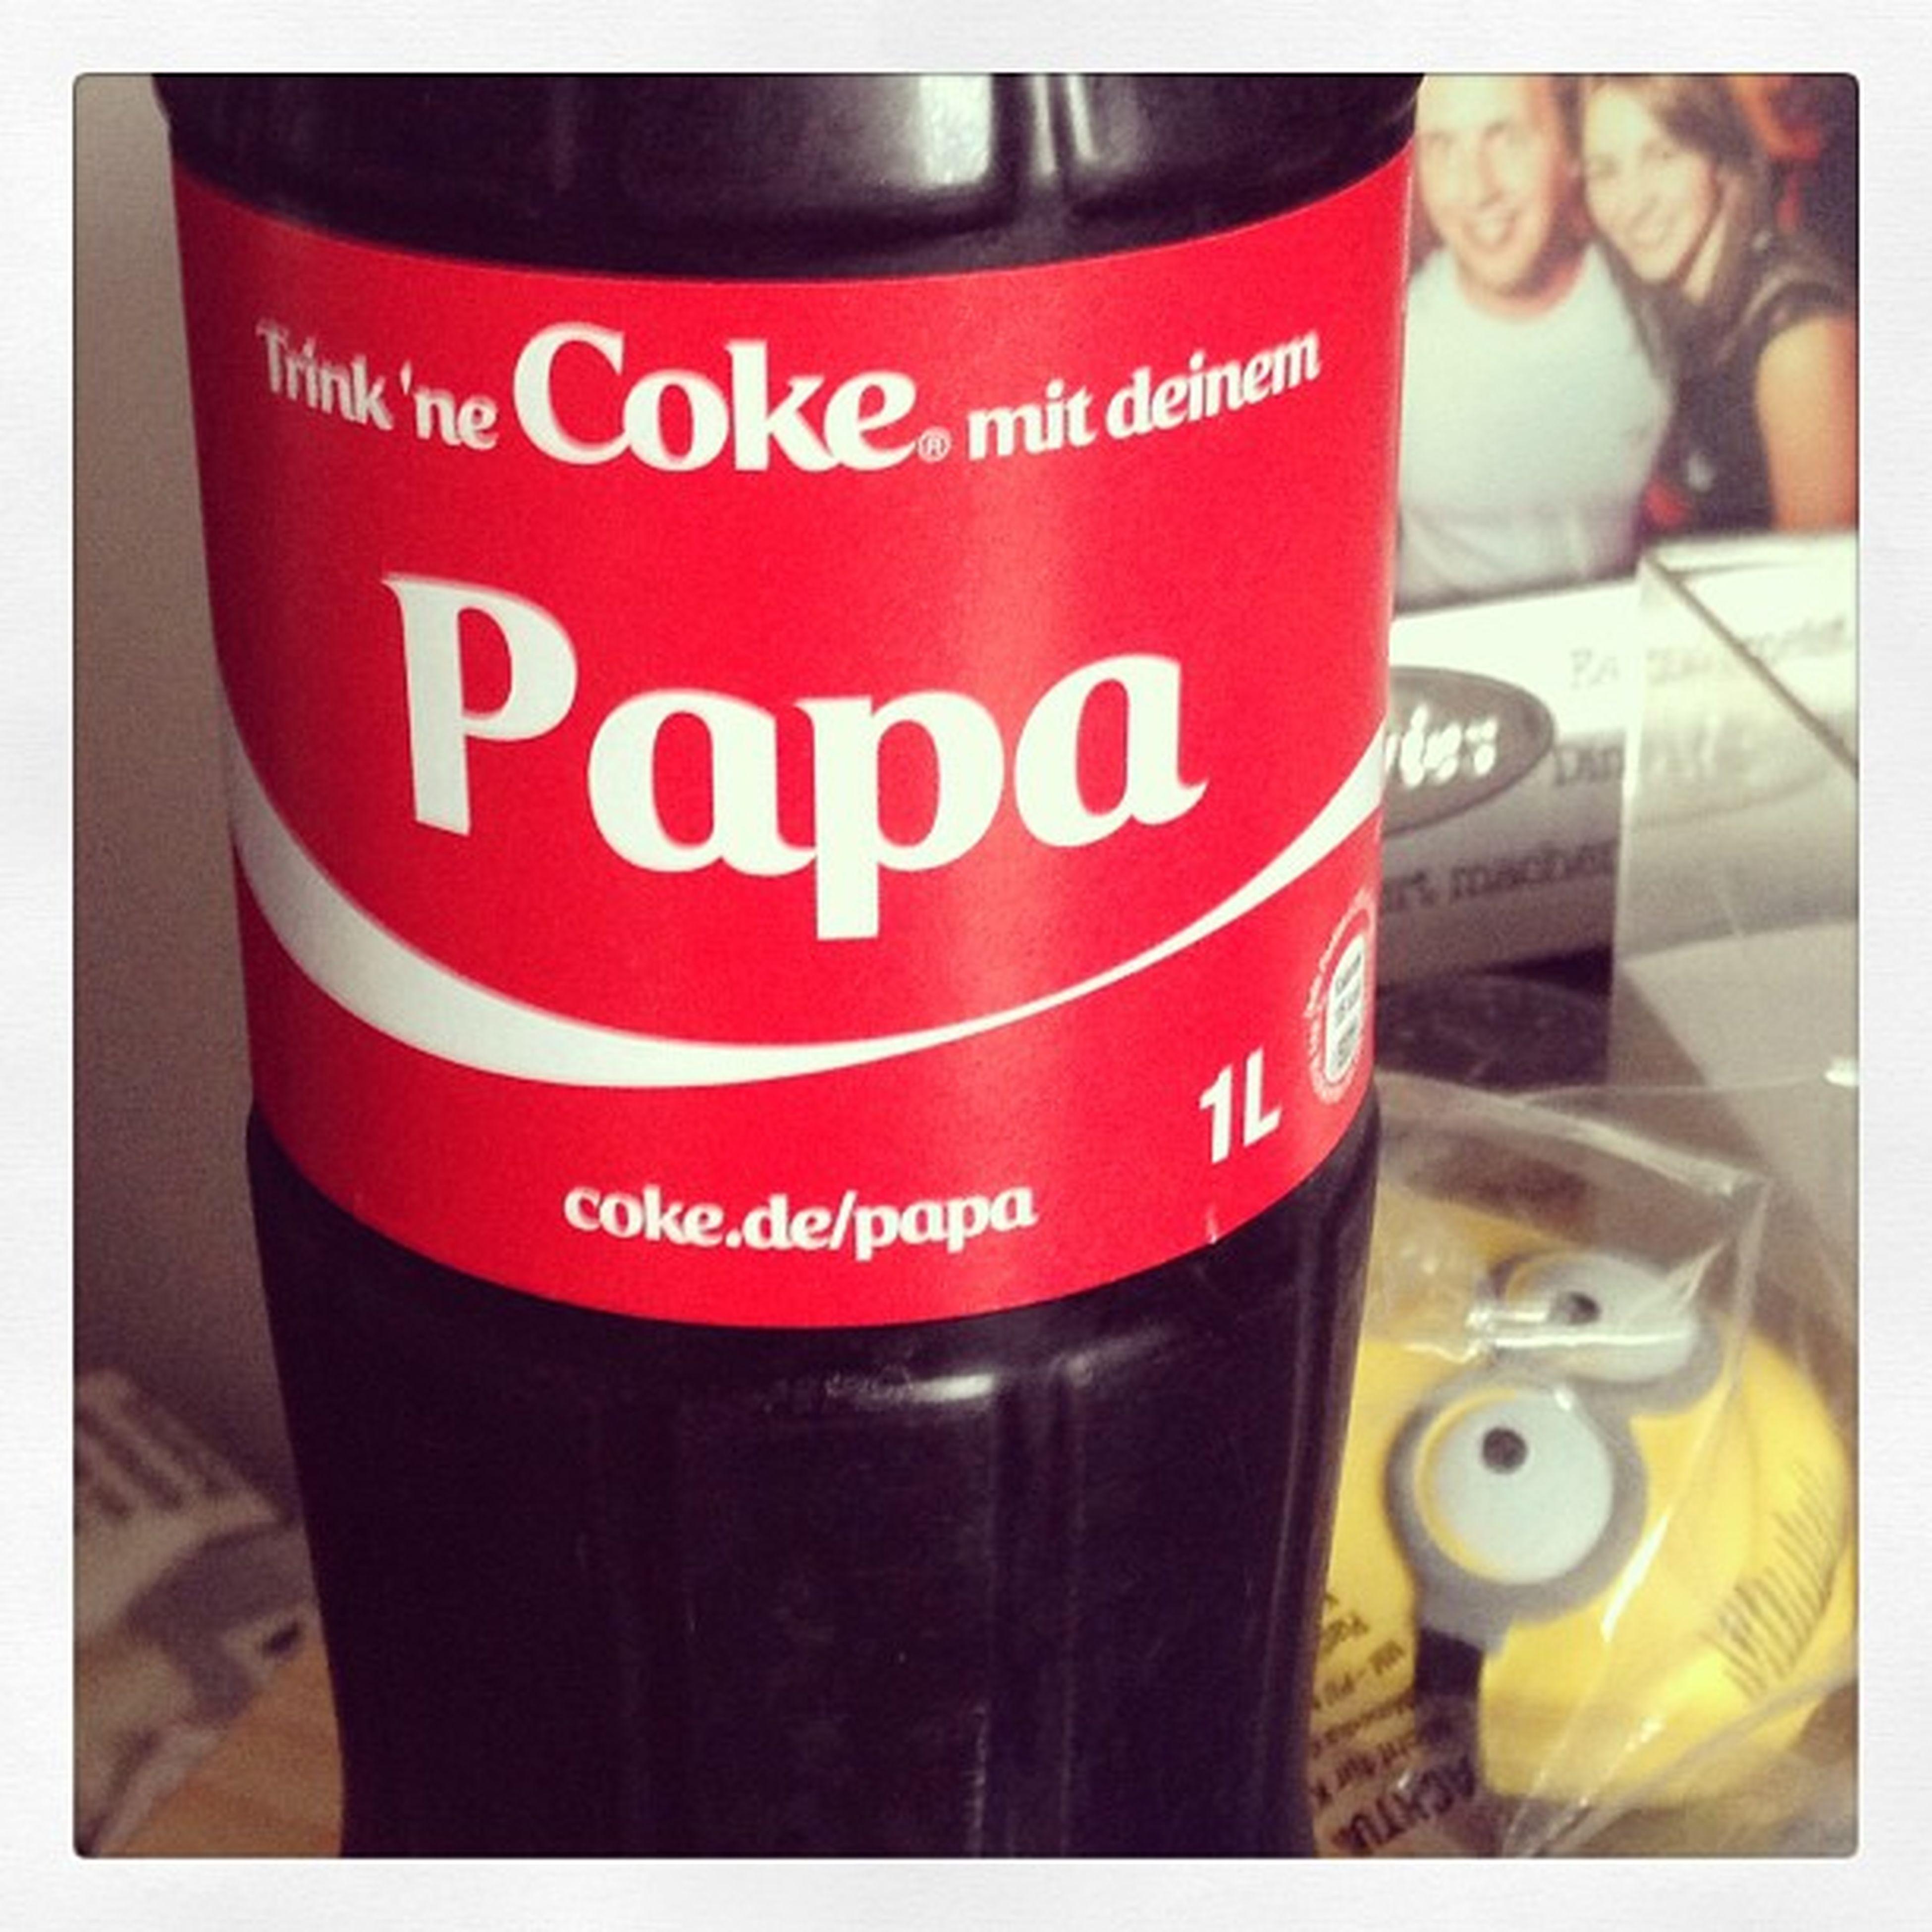 "Trinknecokemit deine Papá sagt Cola.... Vater sagt ""Wo ist der Whisky"" :)"